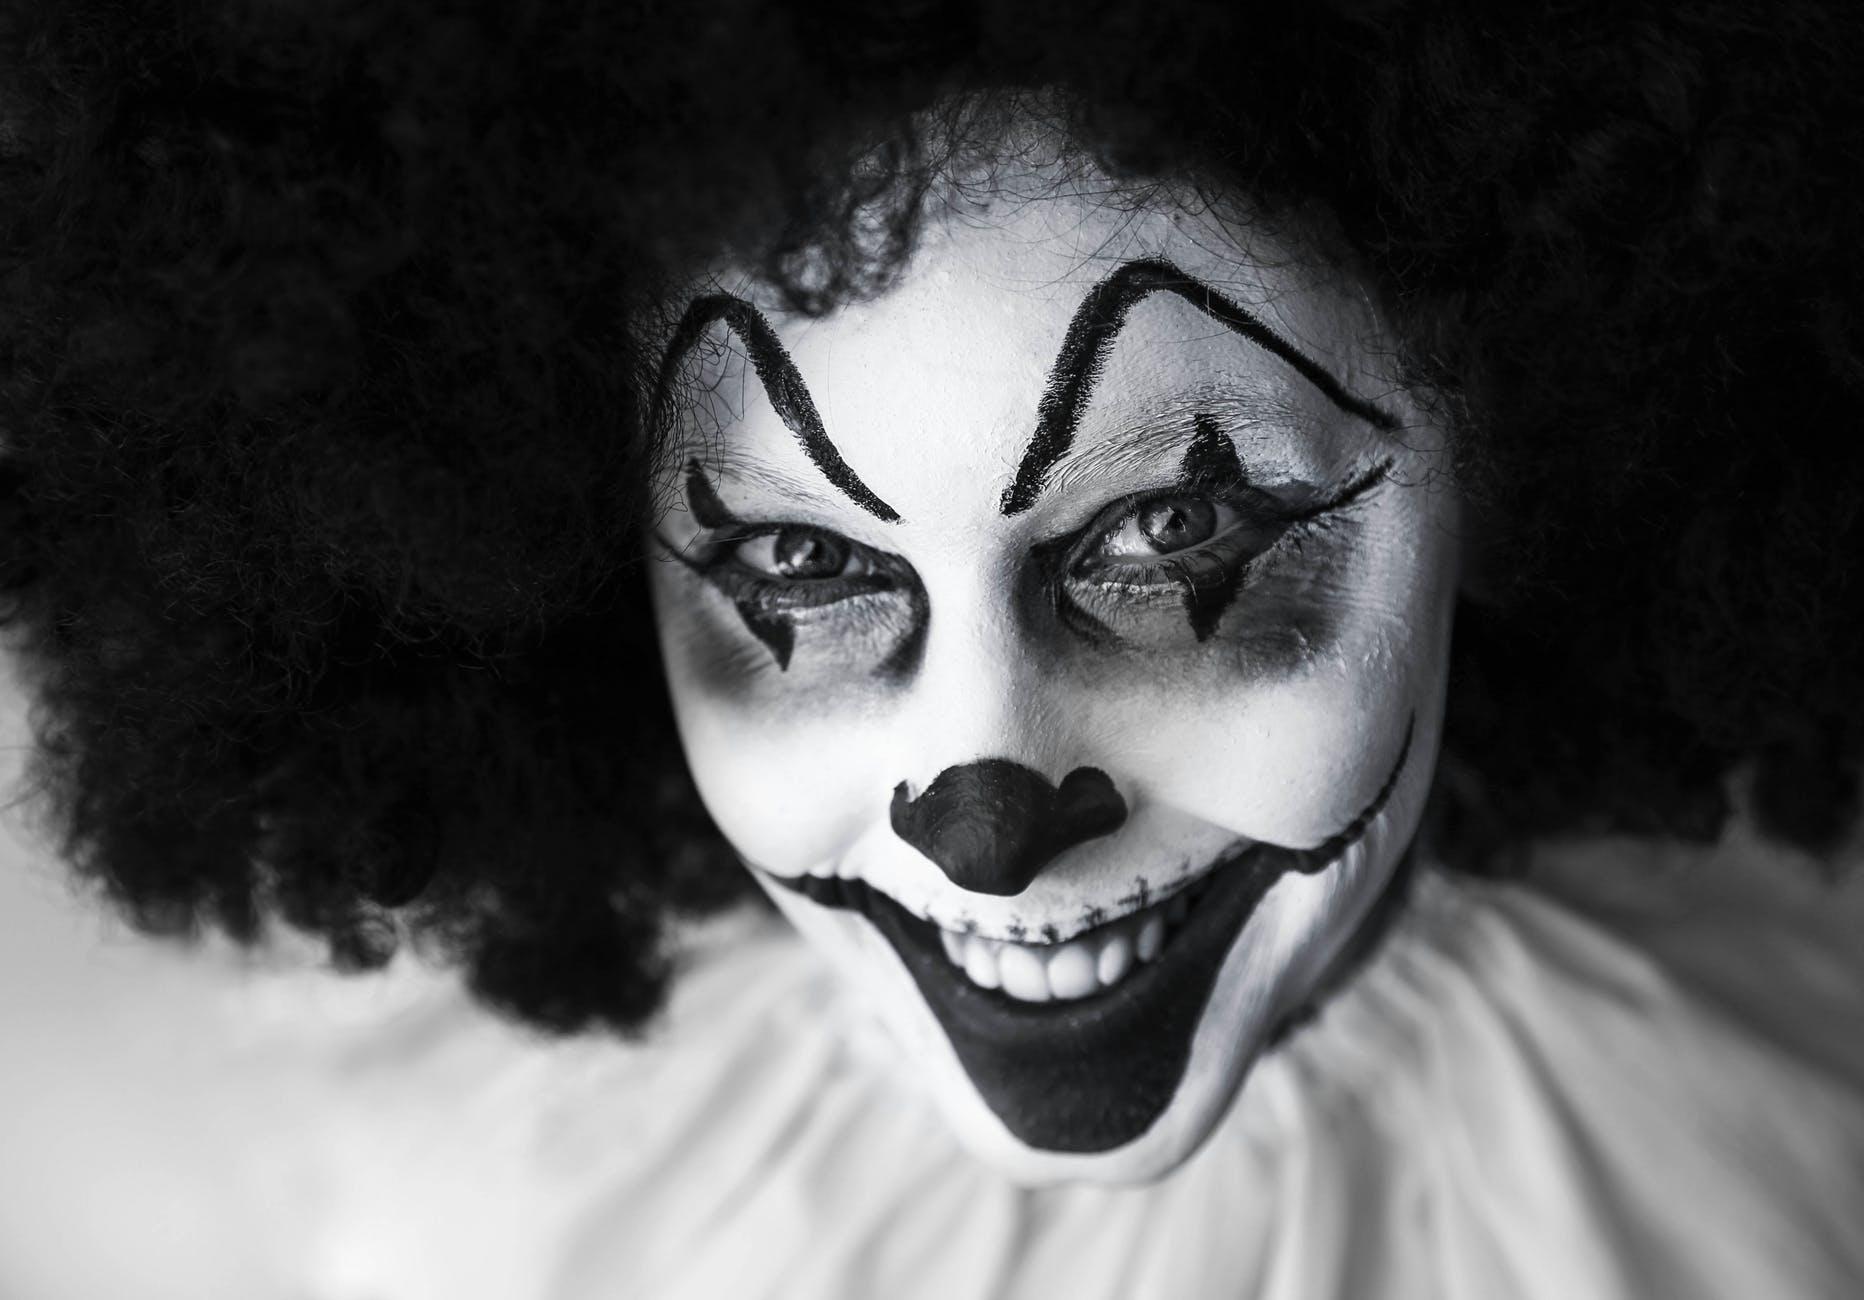 clown creepy grinning facepaint